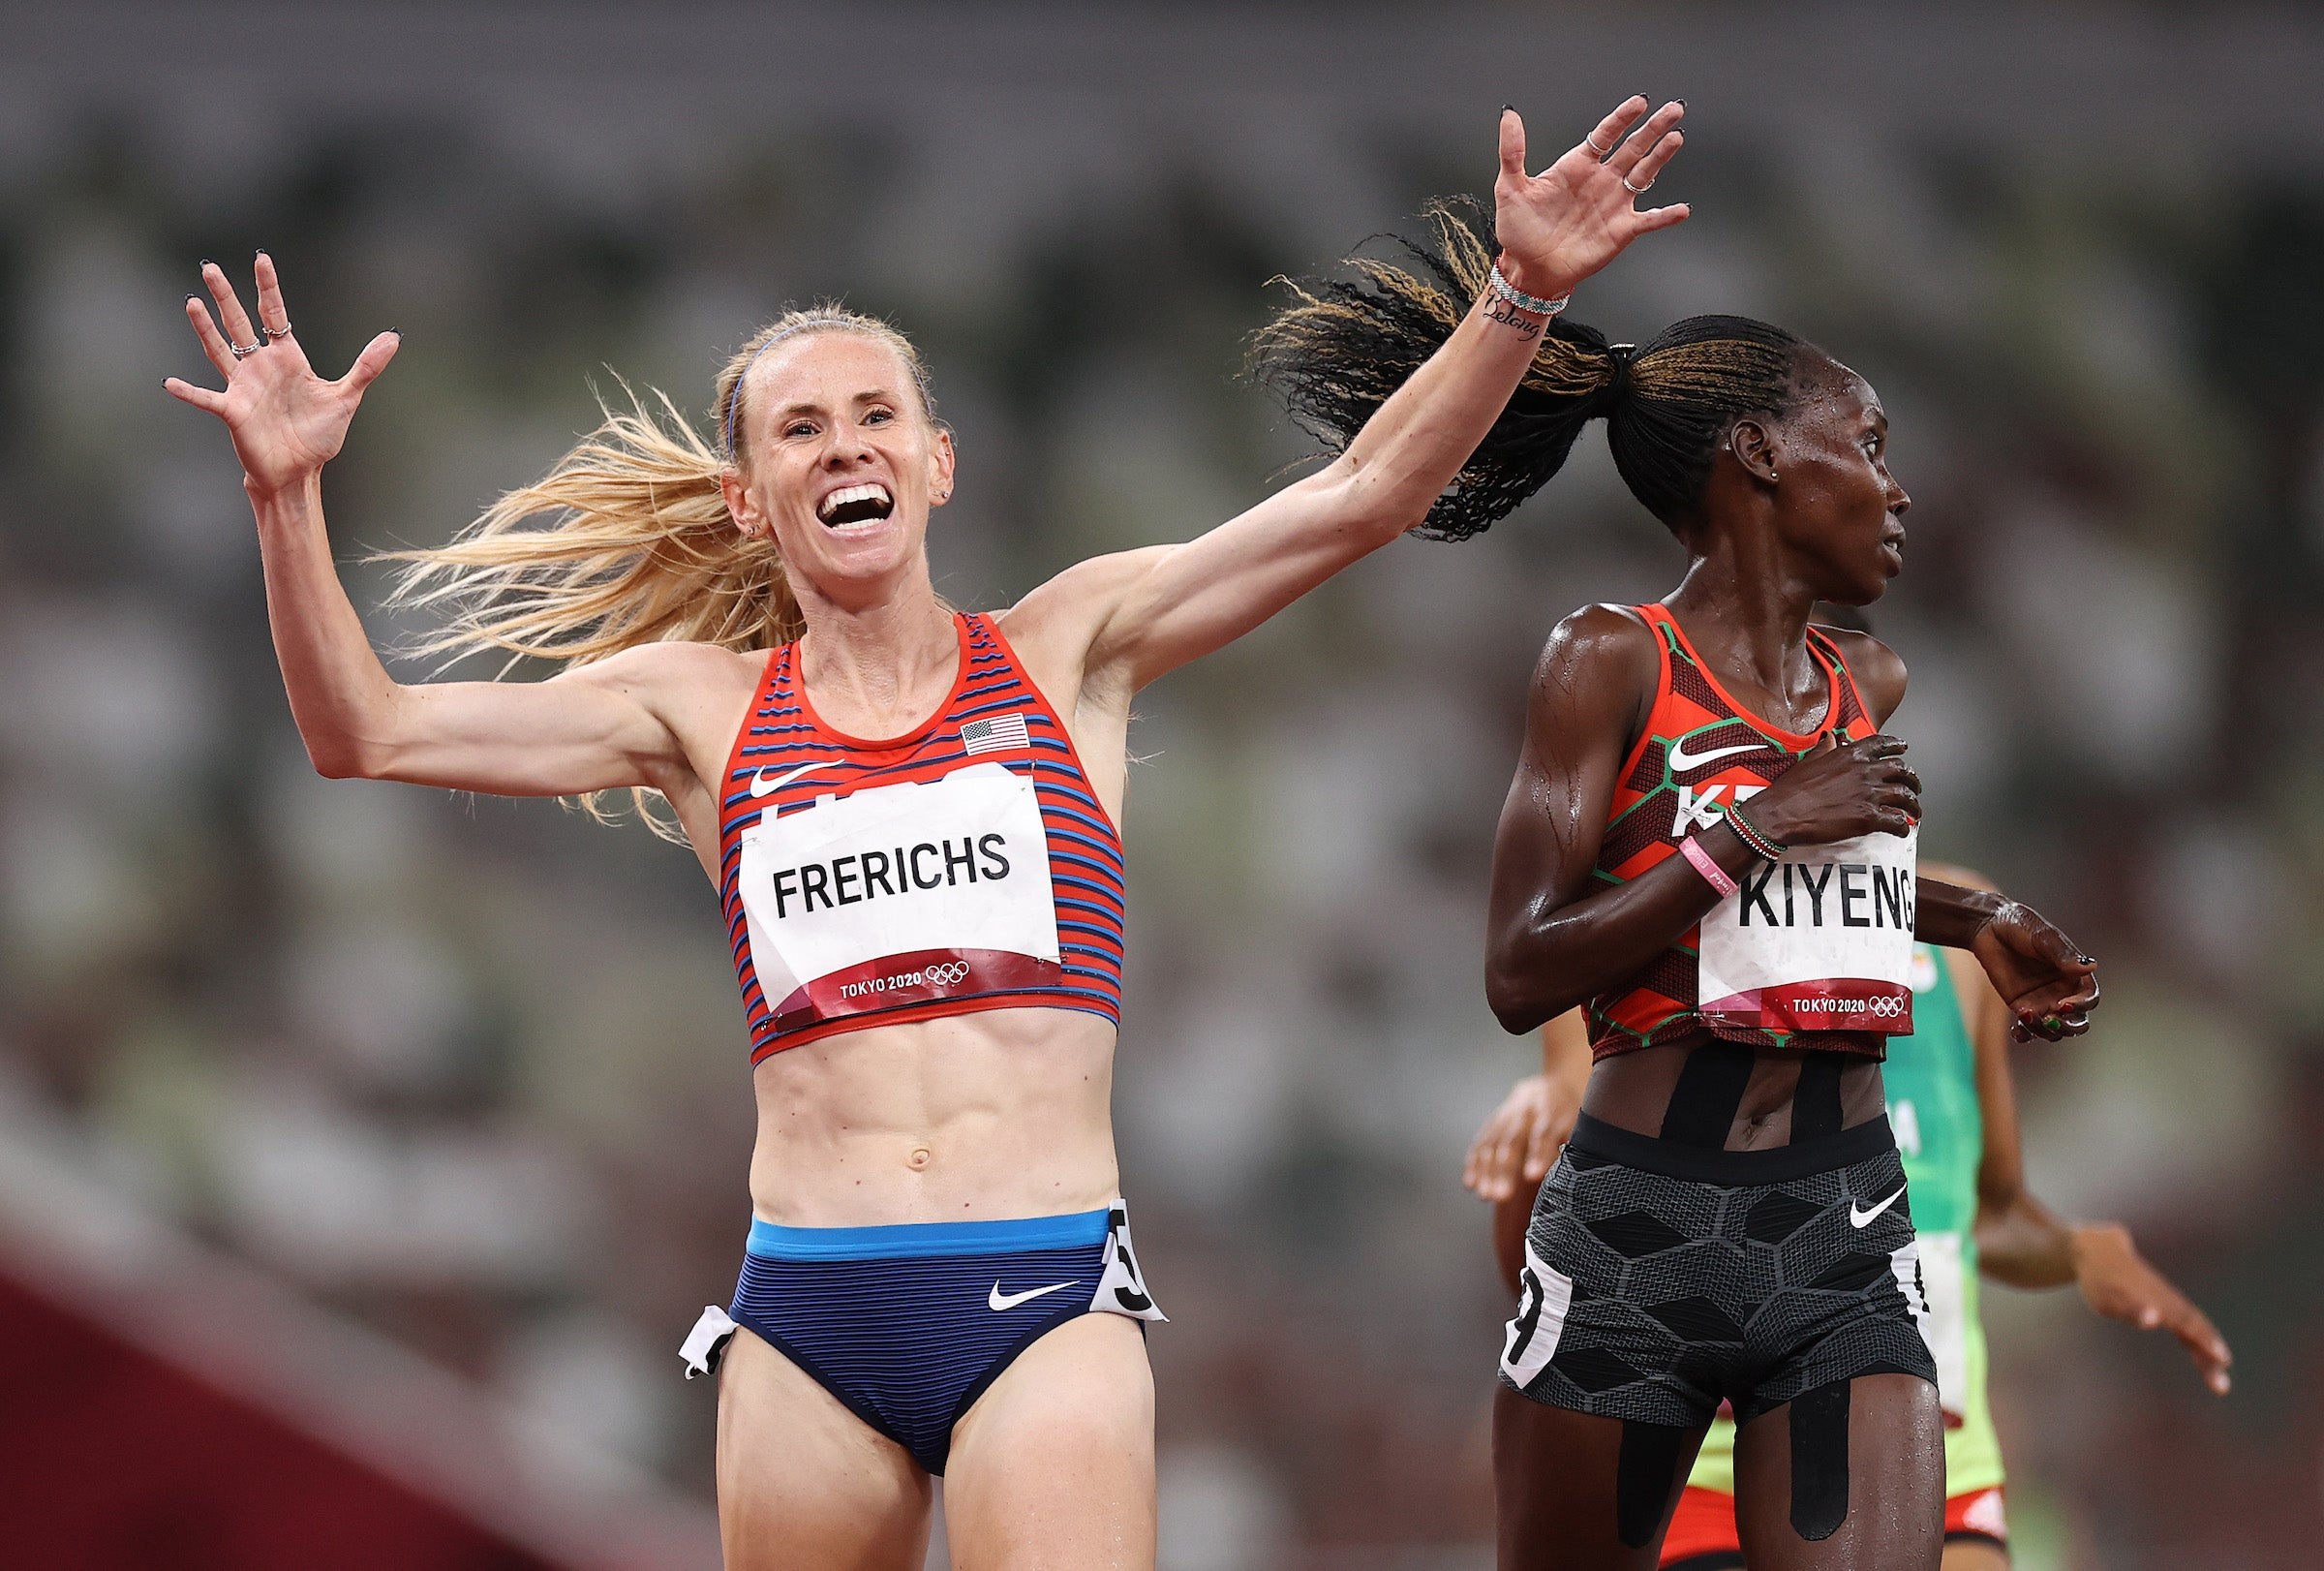 Courtney Frerichs Silver, Peruth Chemutai Gold in 3000m Steeplechase